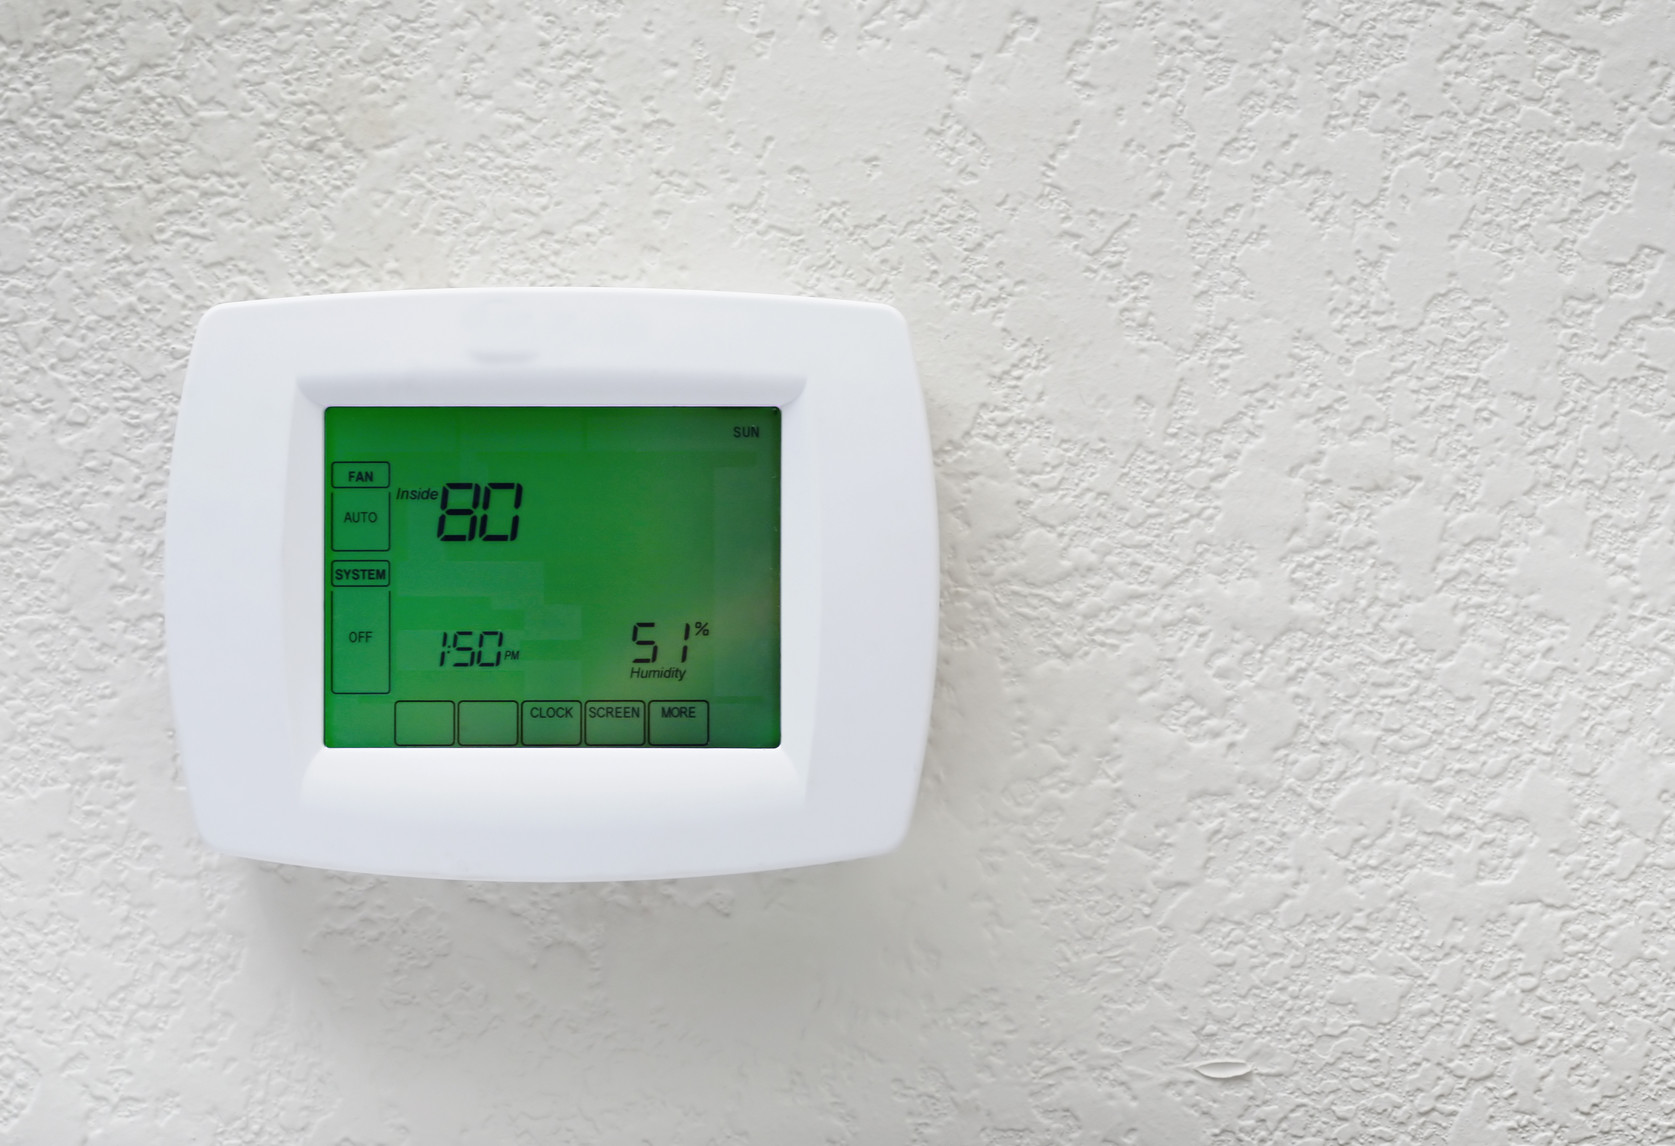 Modern programmable thermostat-energy saving unit